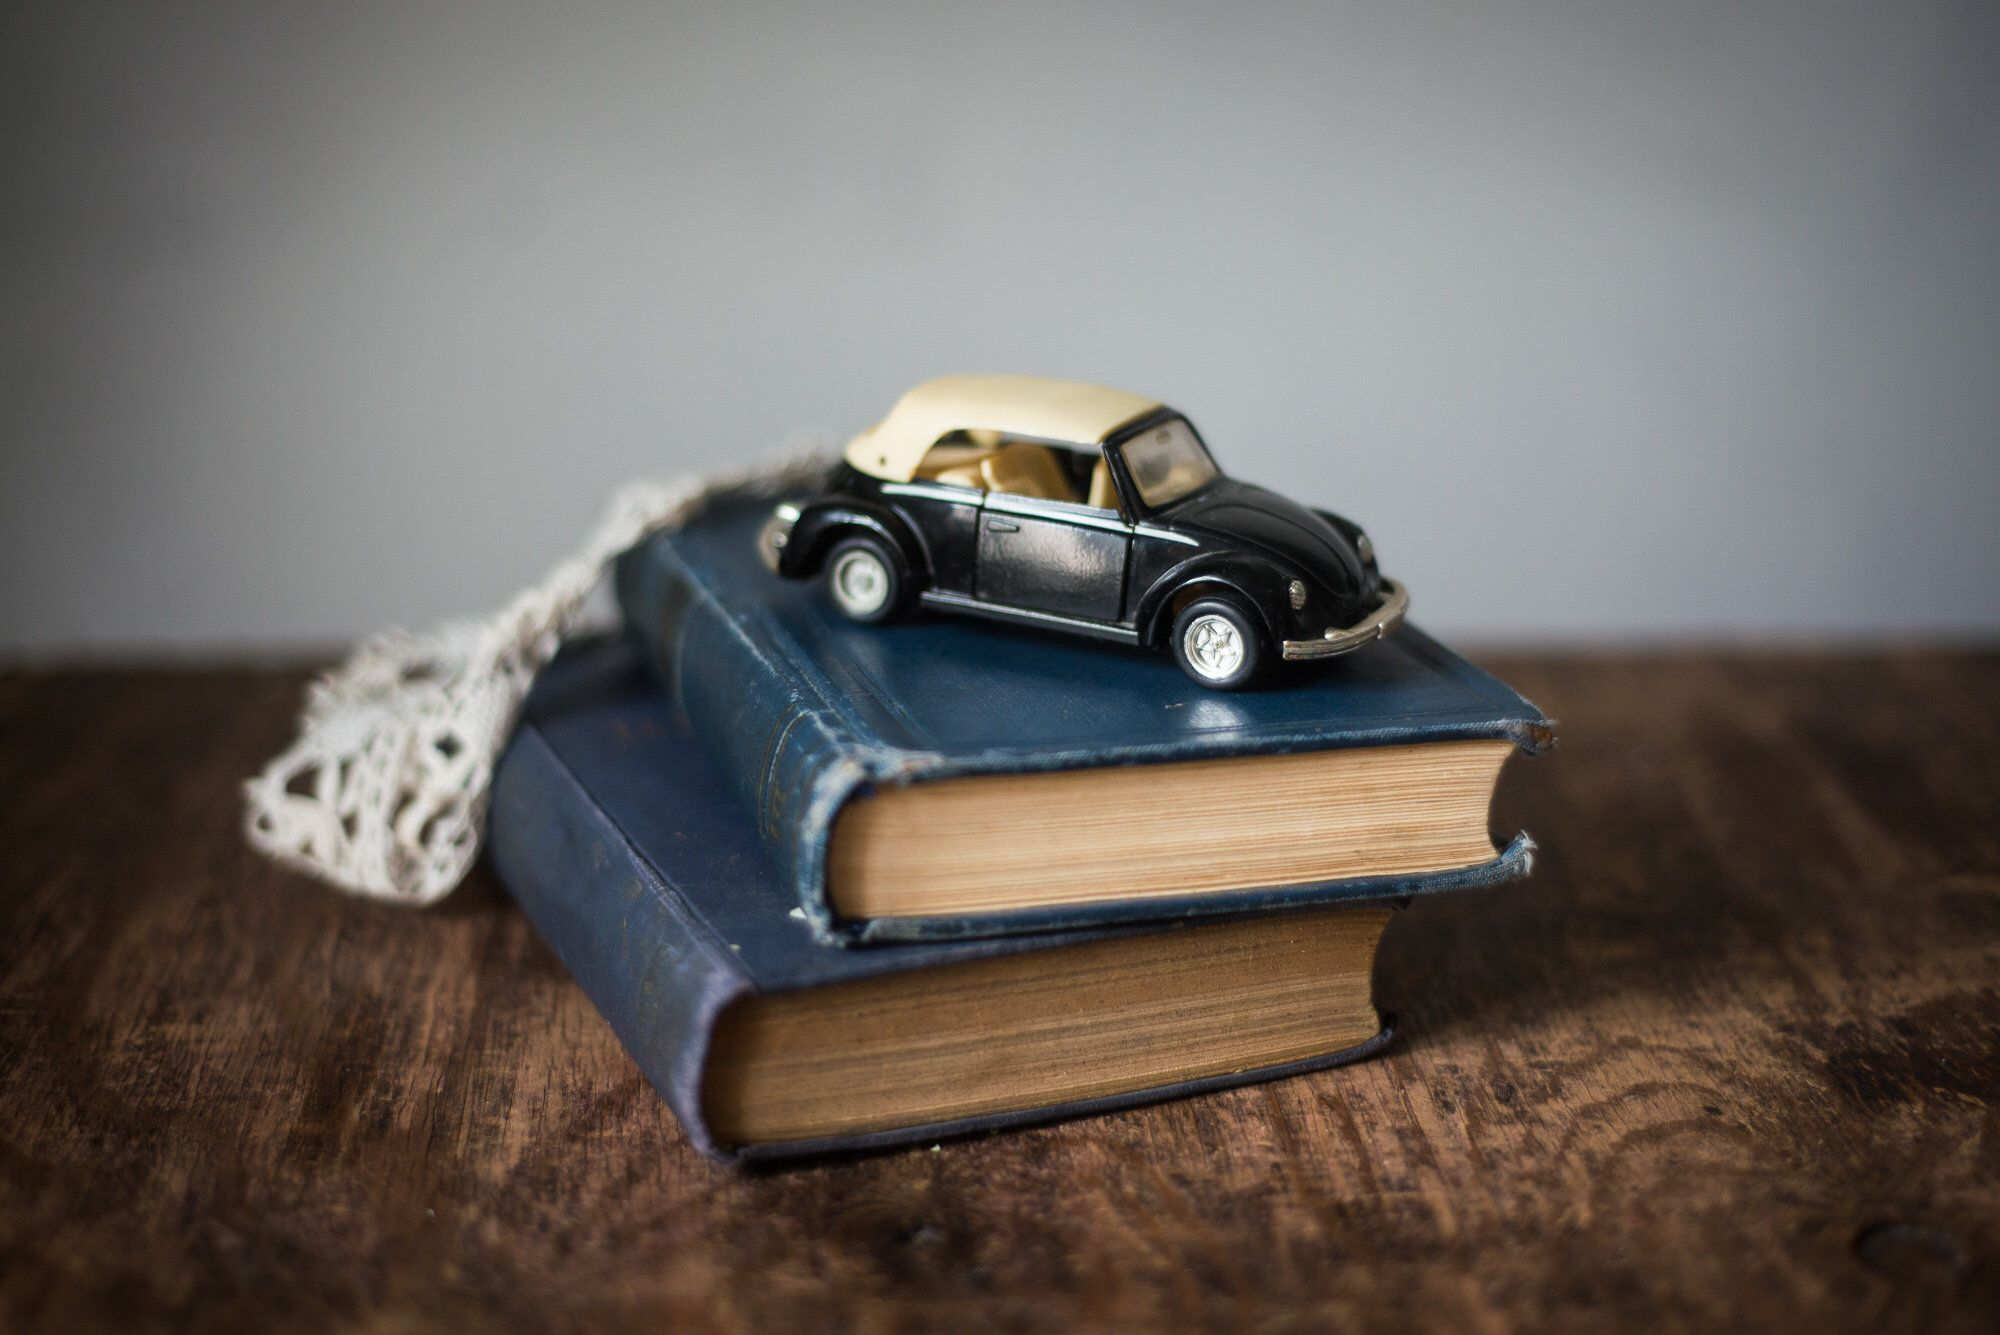 Collectible Vintage Car Miniature Toys